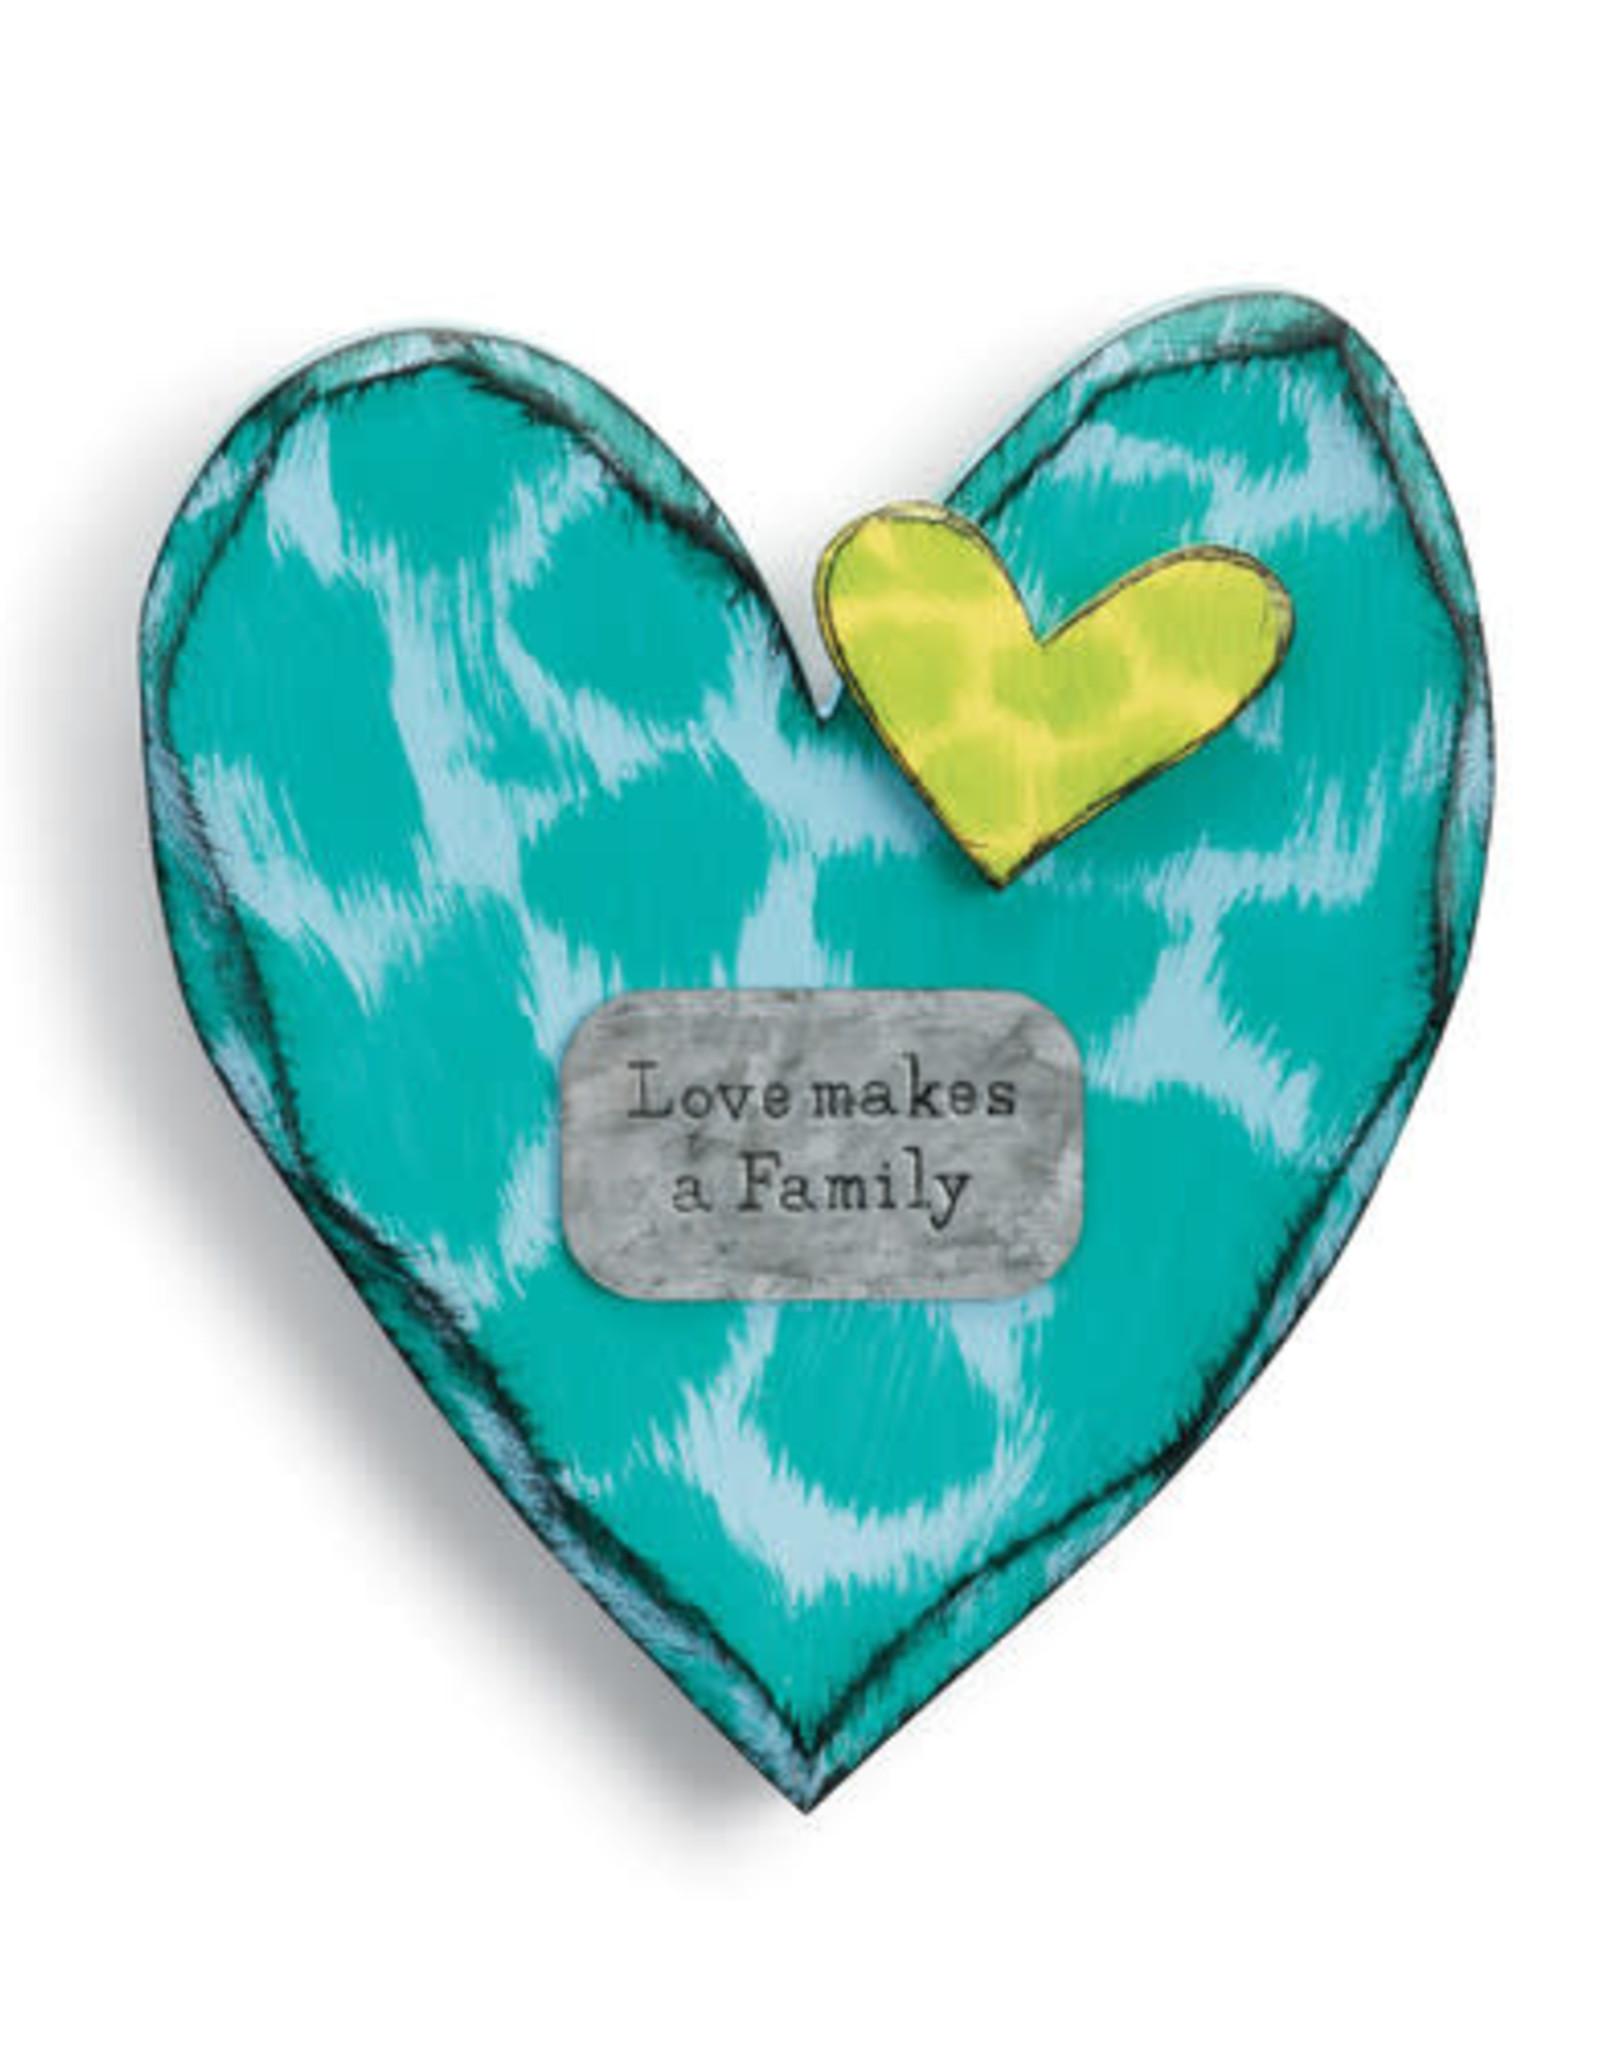 Love Makes a Family Wall Heart